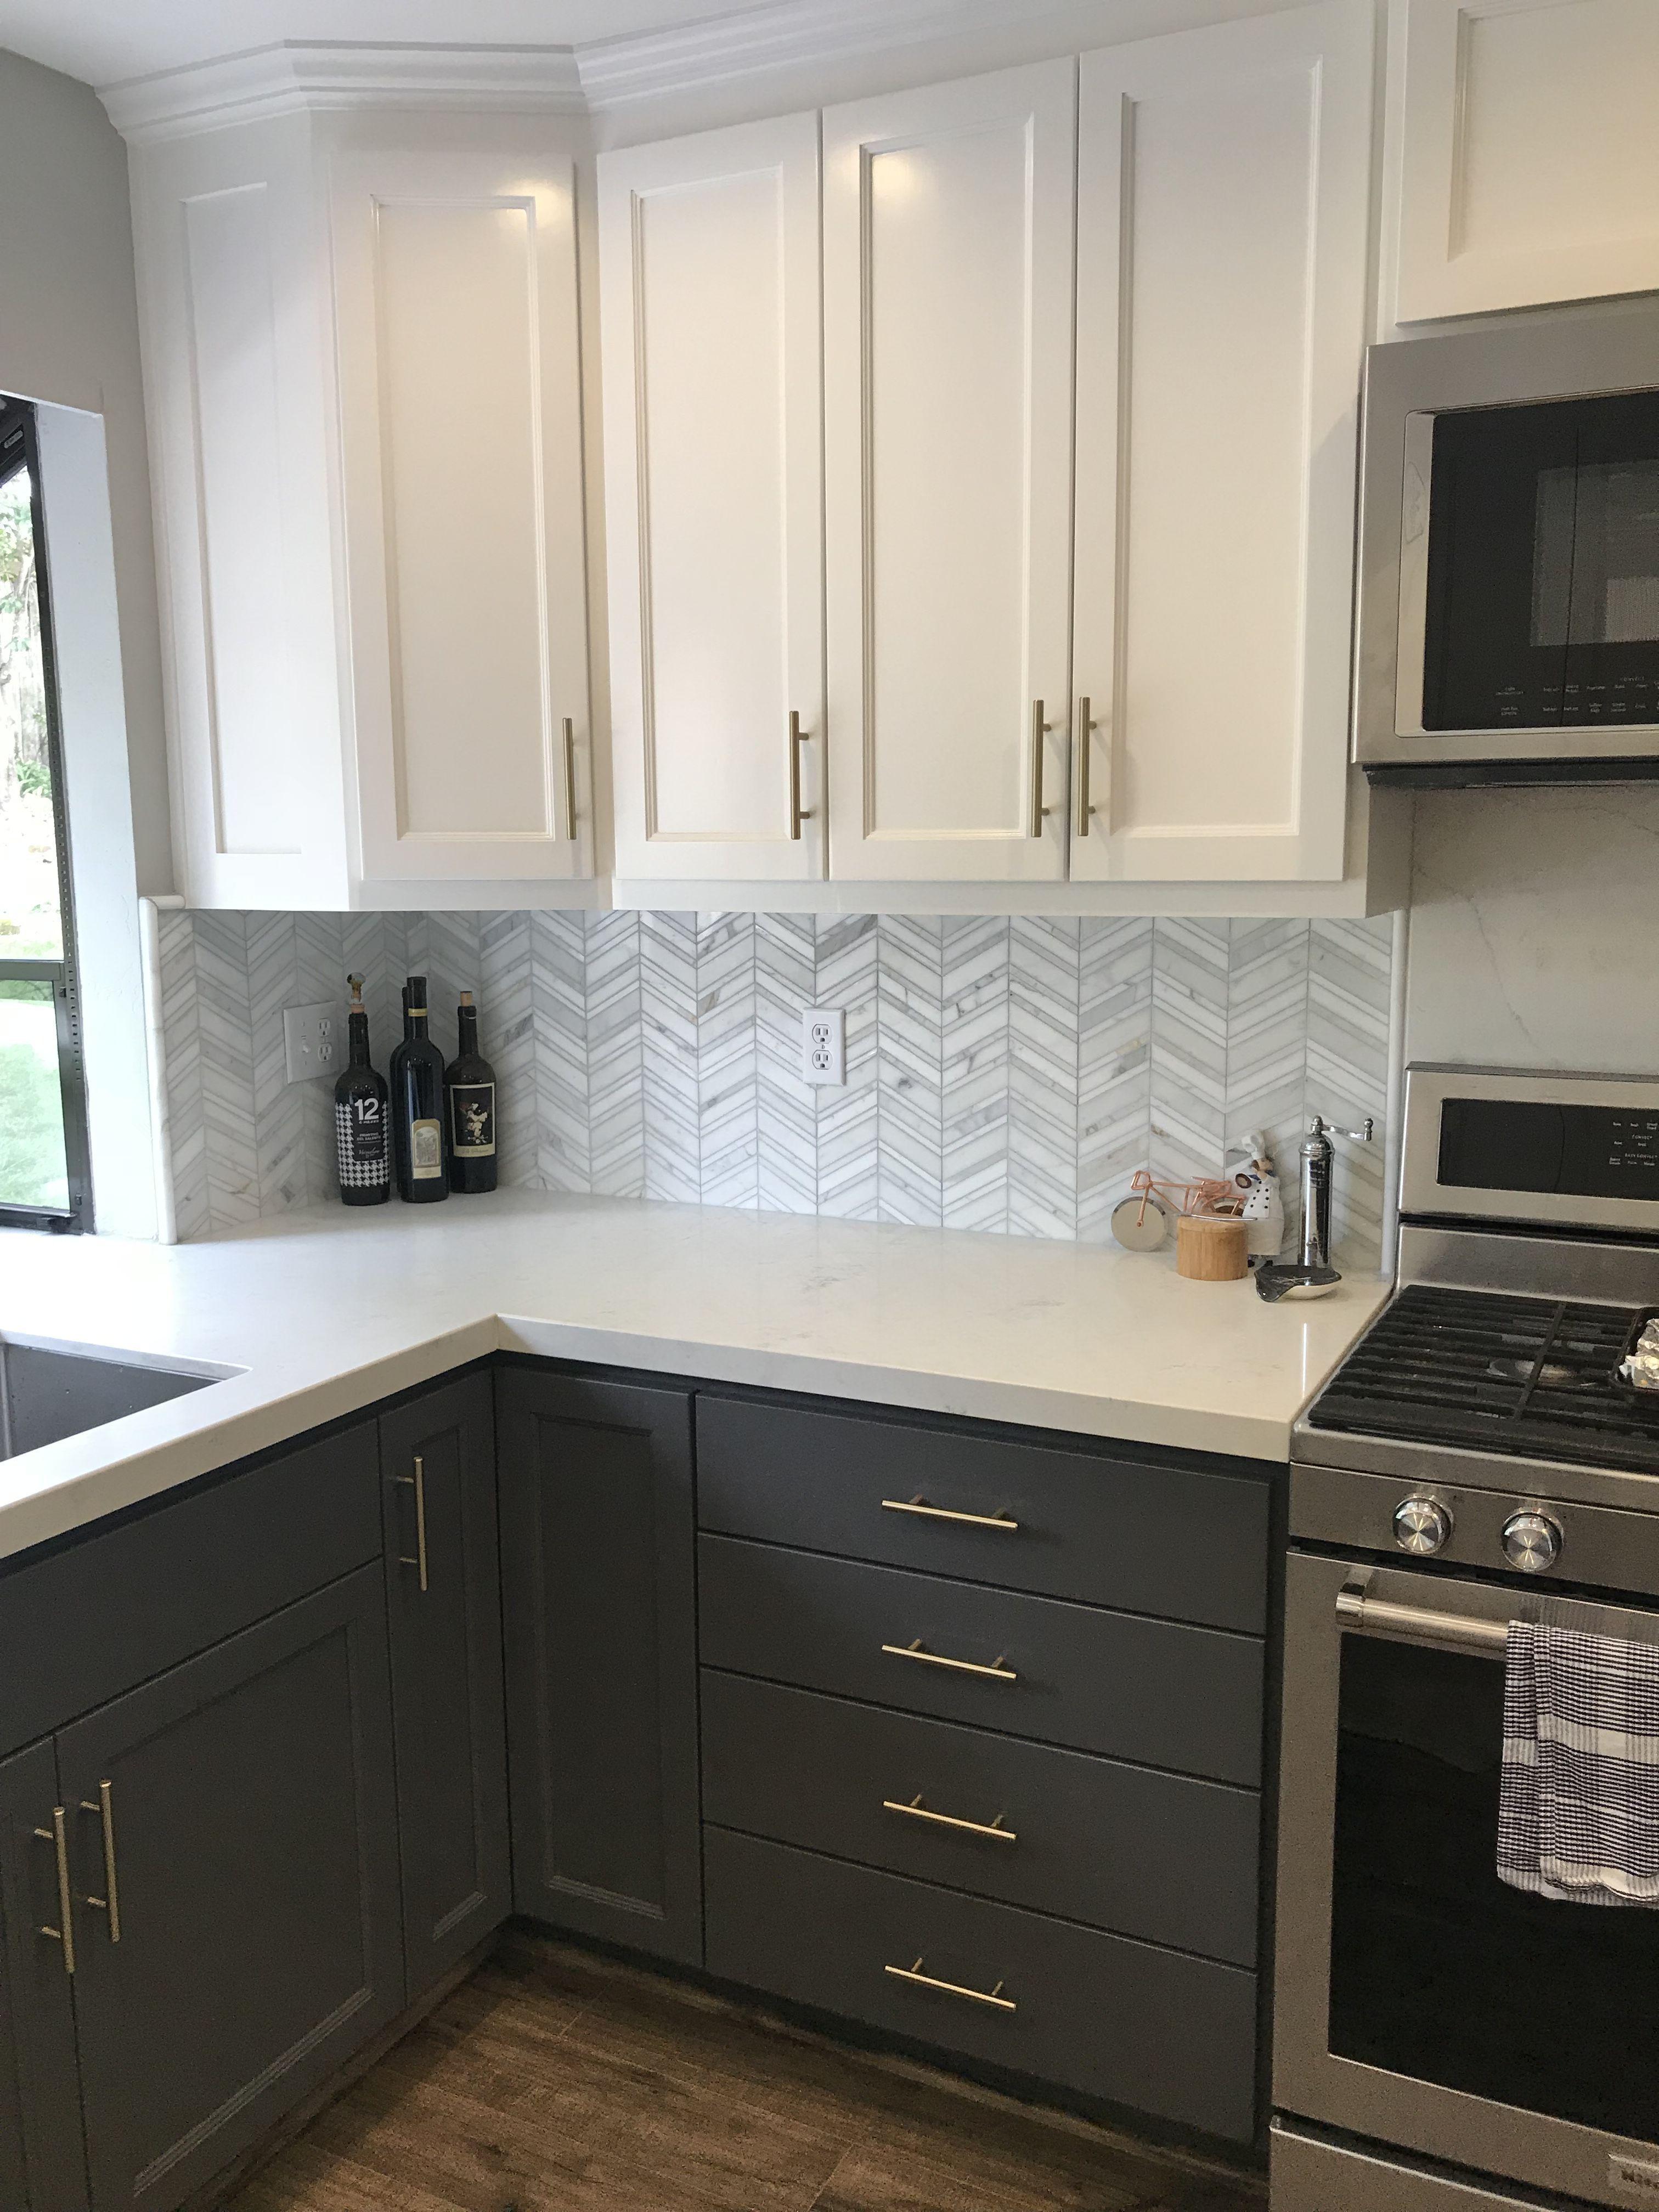 Sherwin Williams Peppercorn Kitchen Cabinets Tipperary Quartz